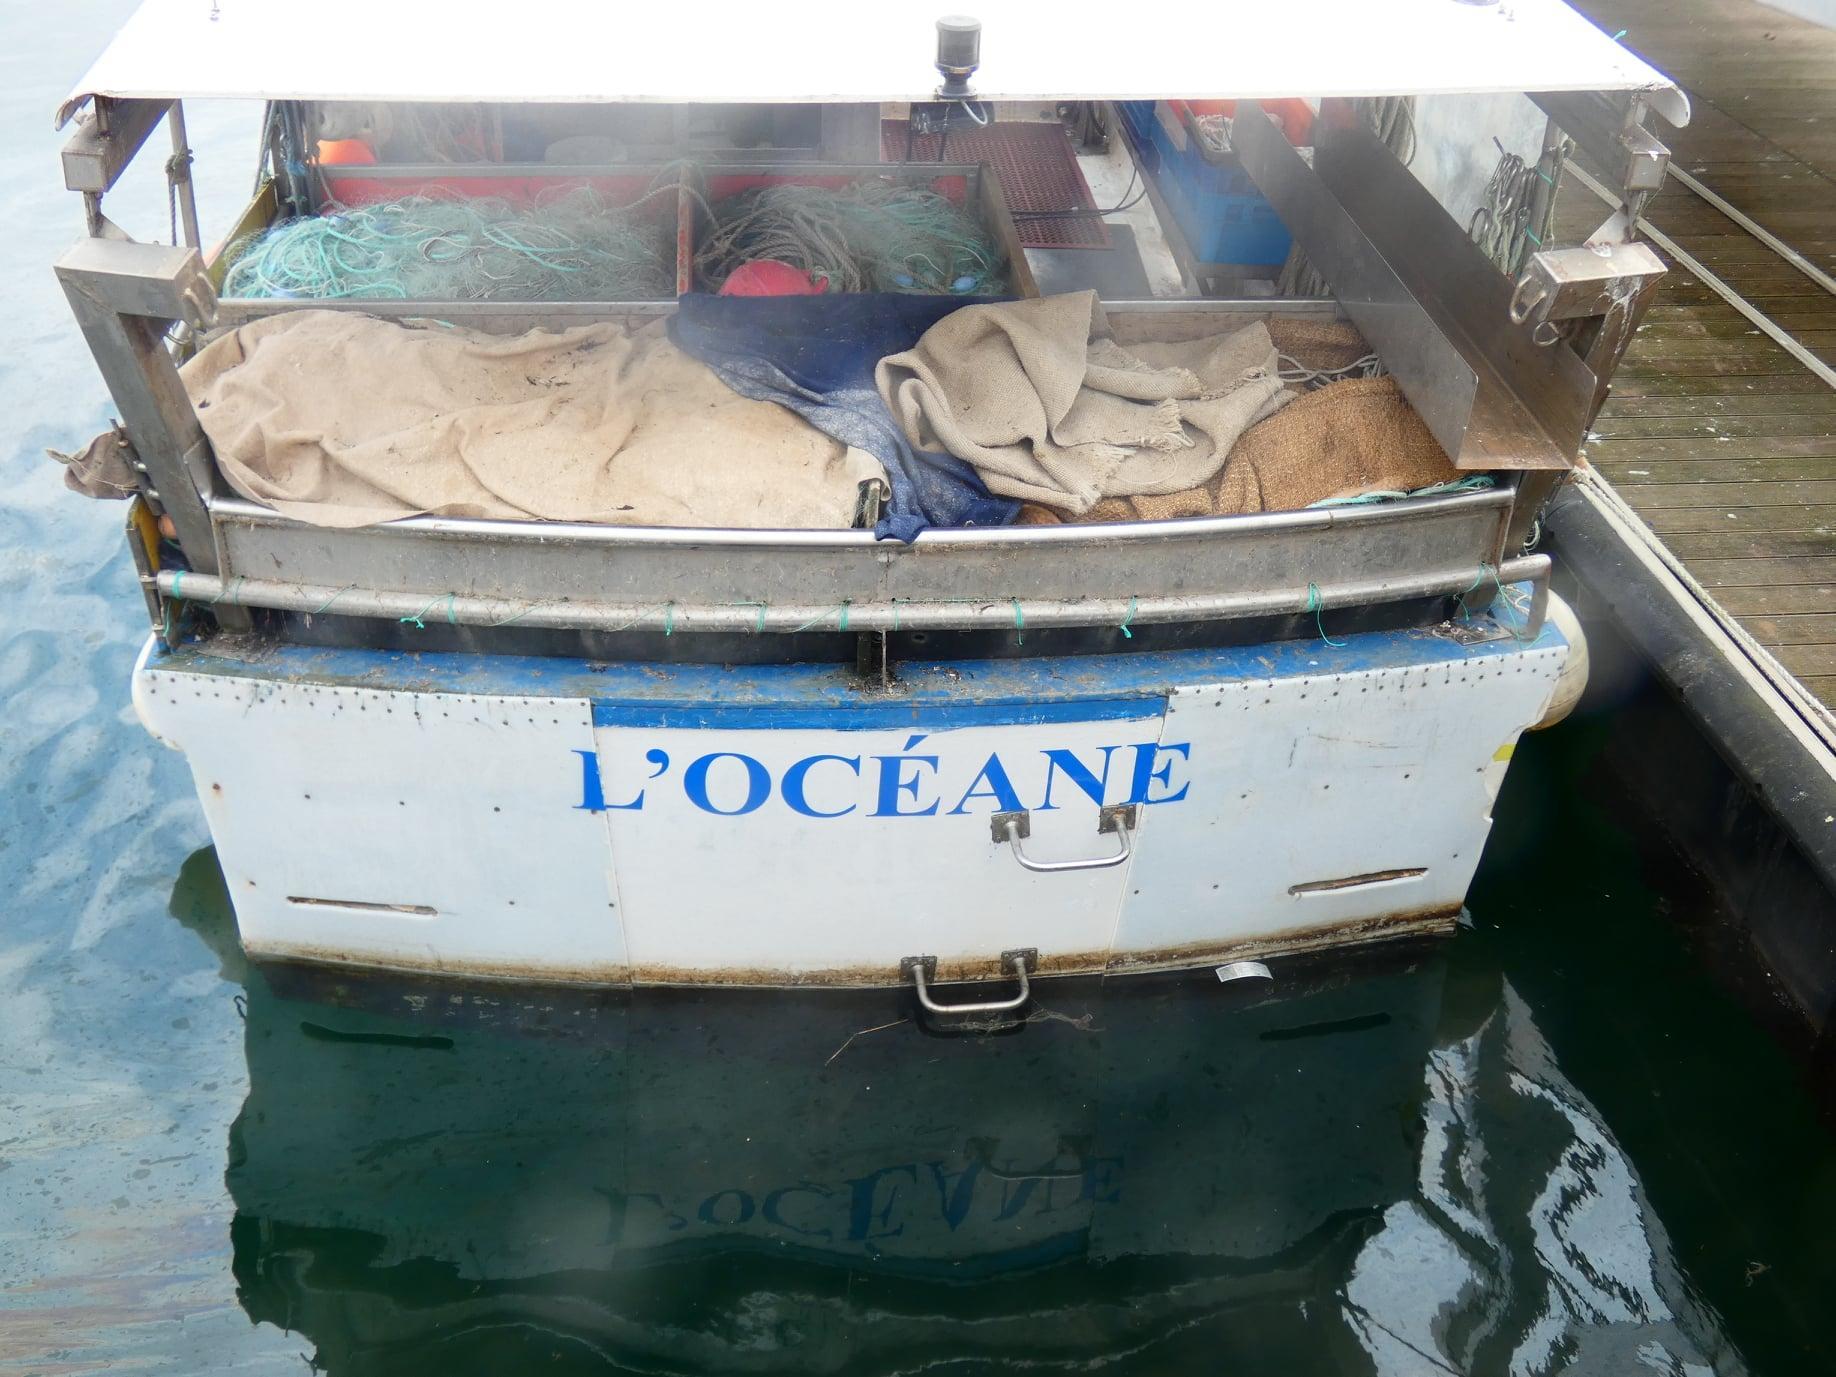 210309 l oceane cc b romain wallet